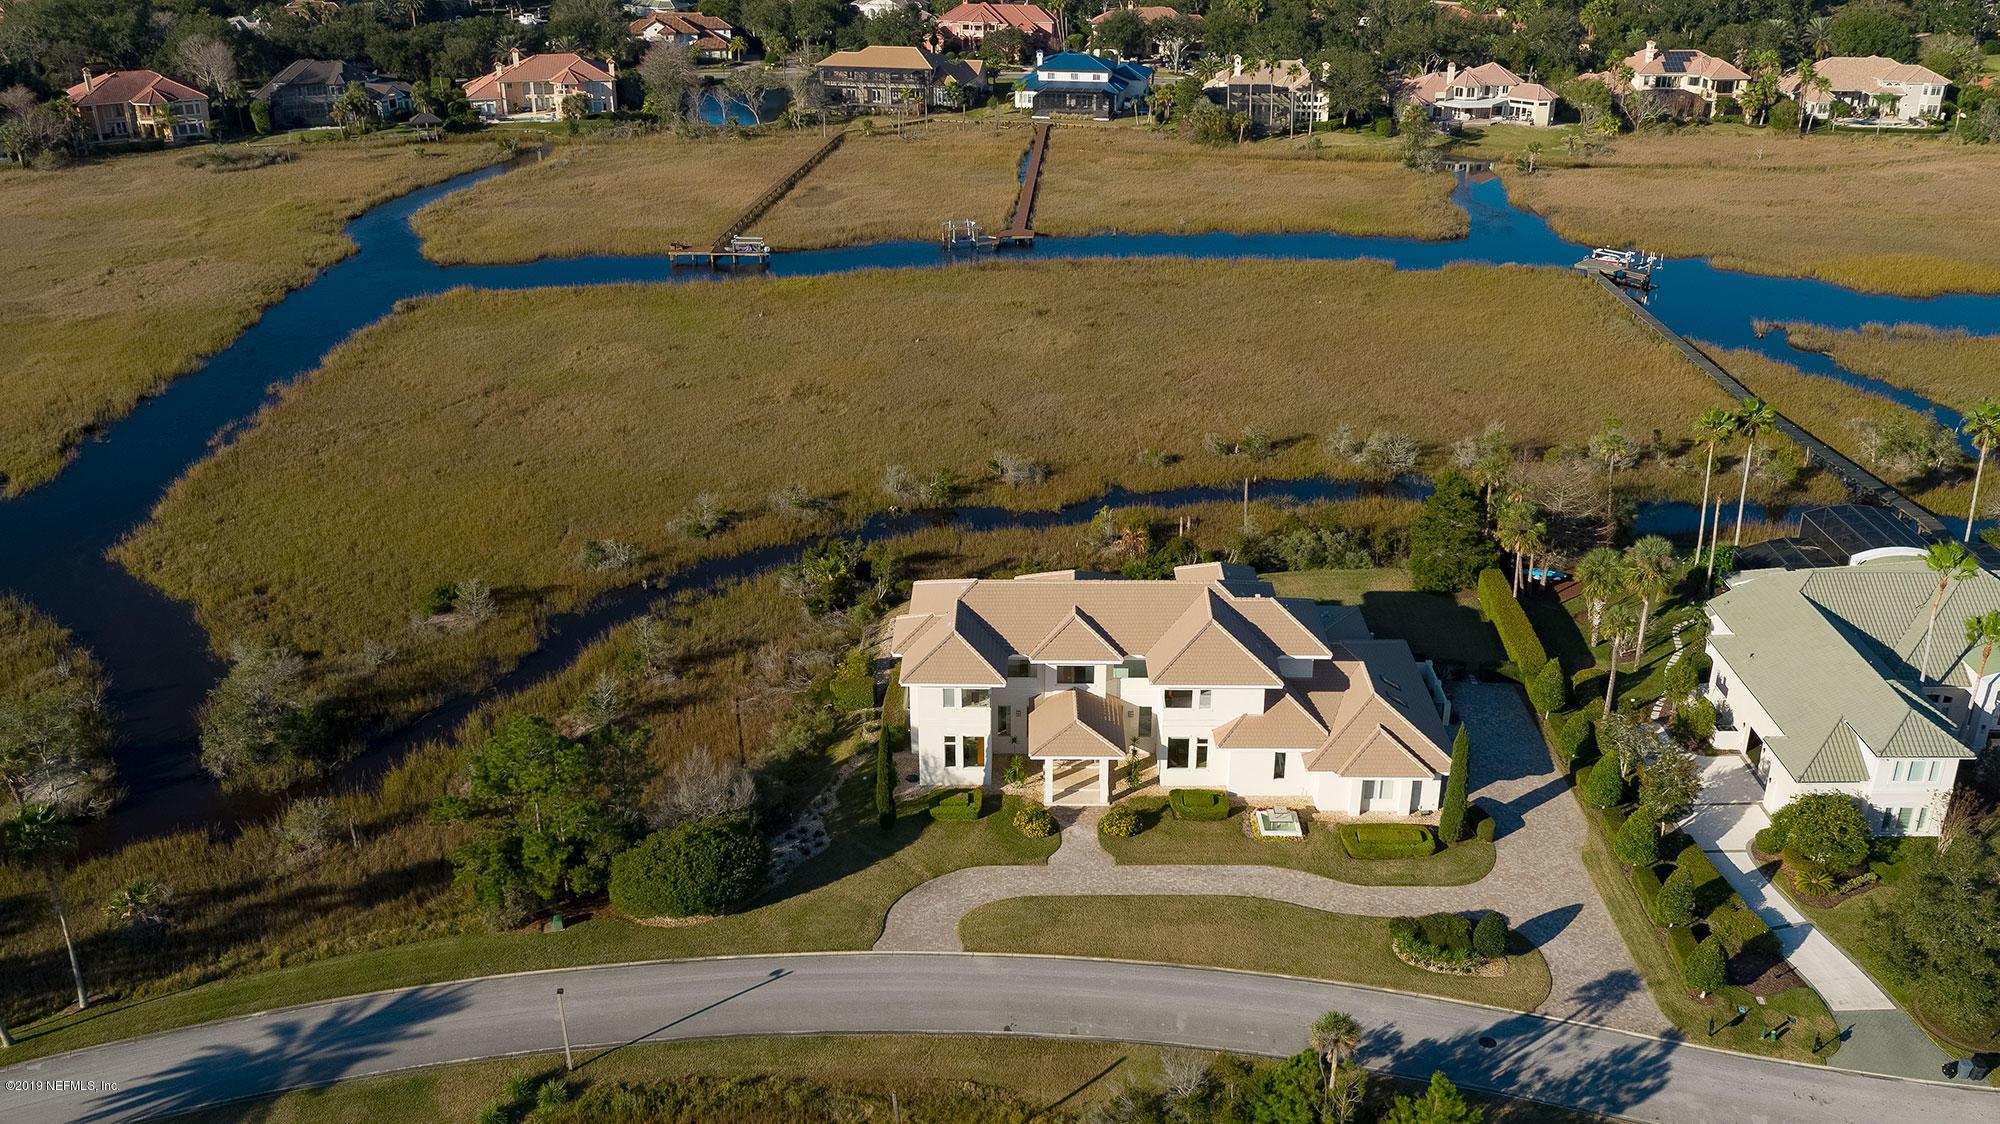 201 DEER HAVEN, PONTE VEDRA BEACH, FLORIDA 32082, 7 Bedrooms Bedrooms, ,7 BathroomsBathrooms,Residential - single family,For sale,DEER HAVEN,976139